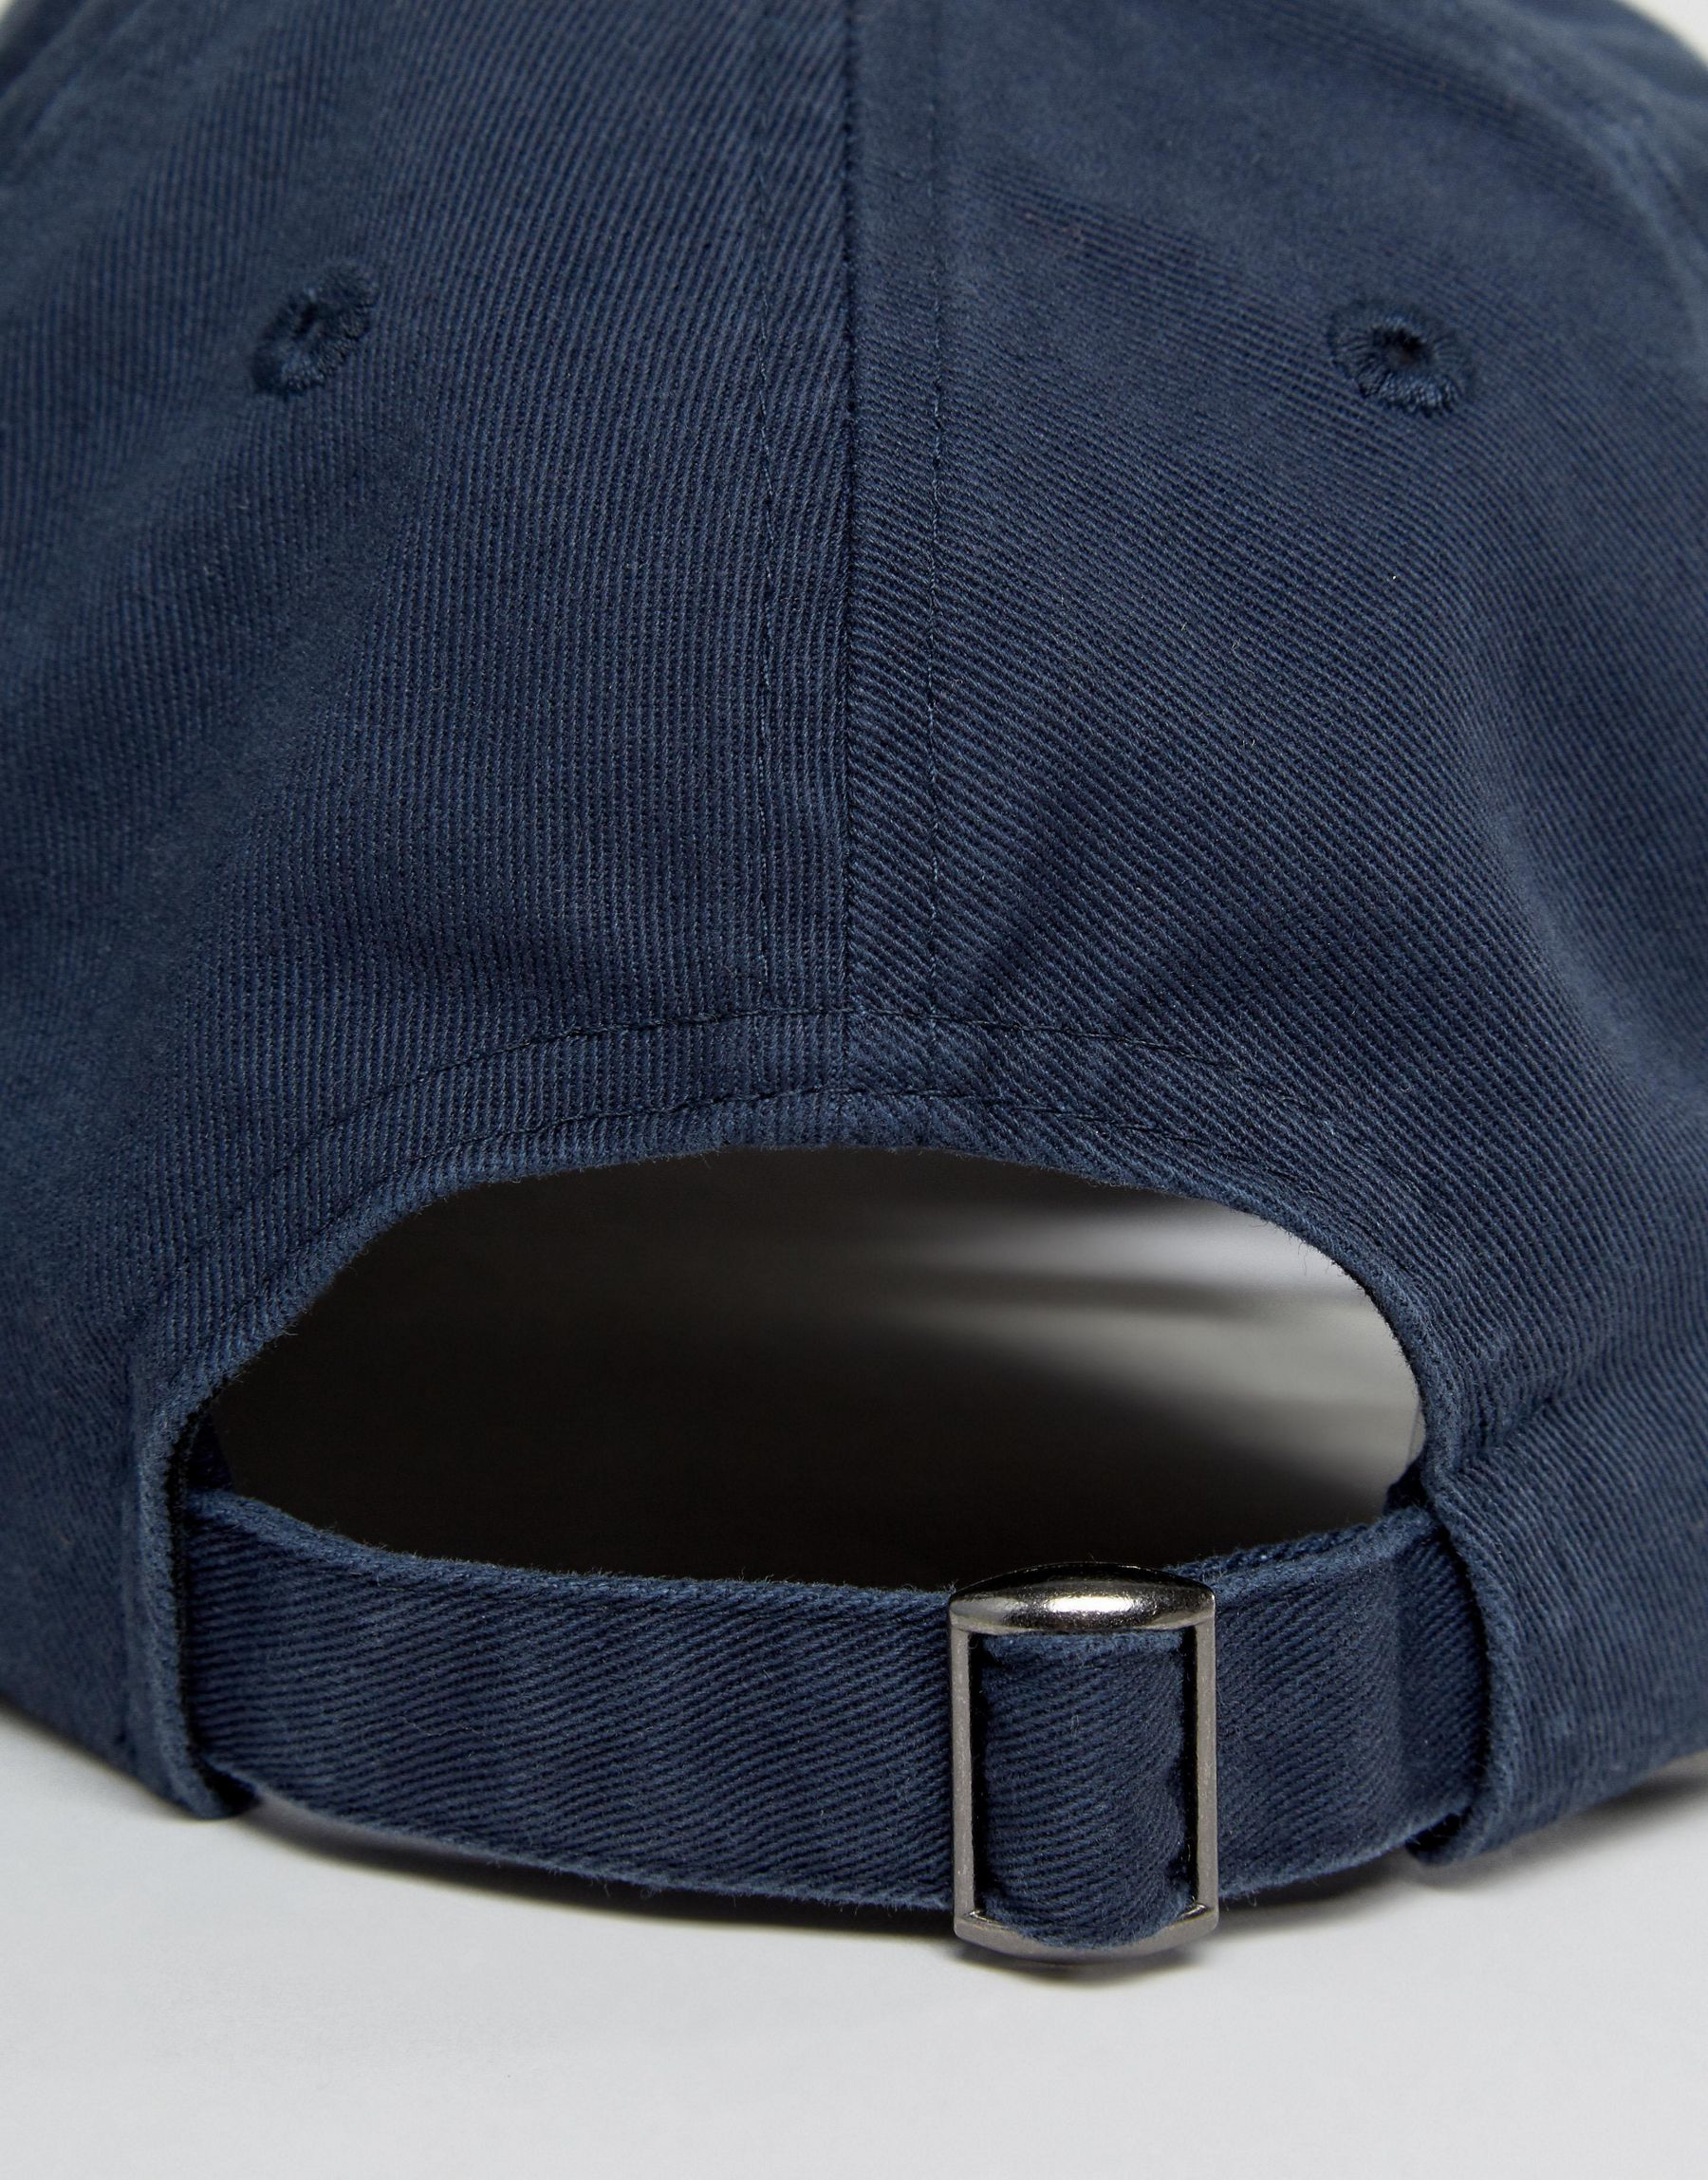 3cab4011460 Lyst - Farah Baseball Cap Navy in Blue for Men